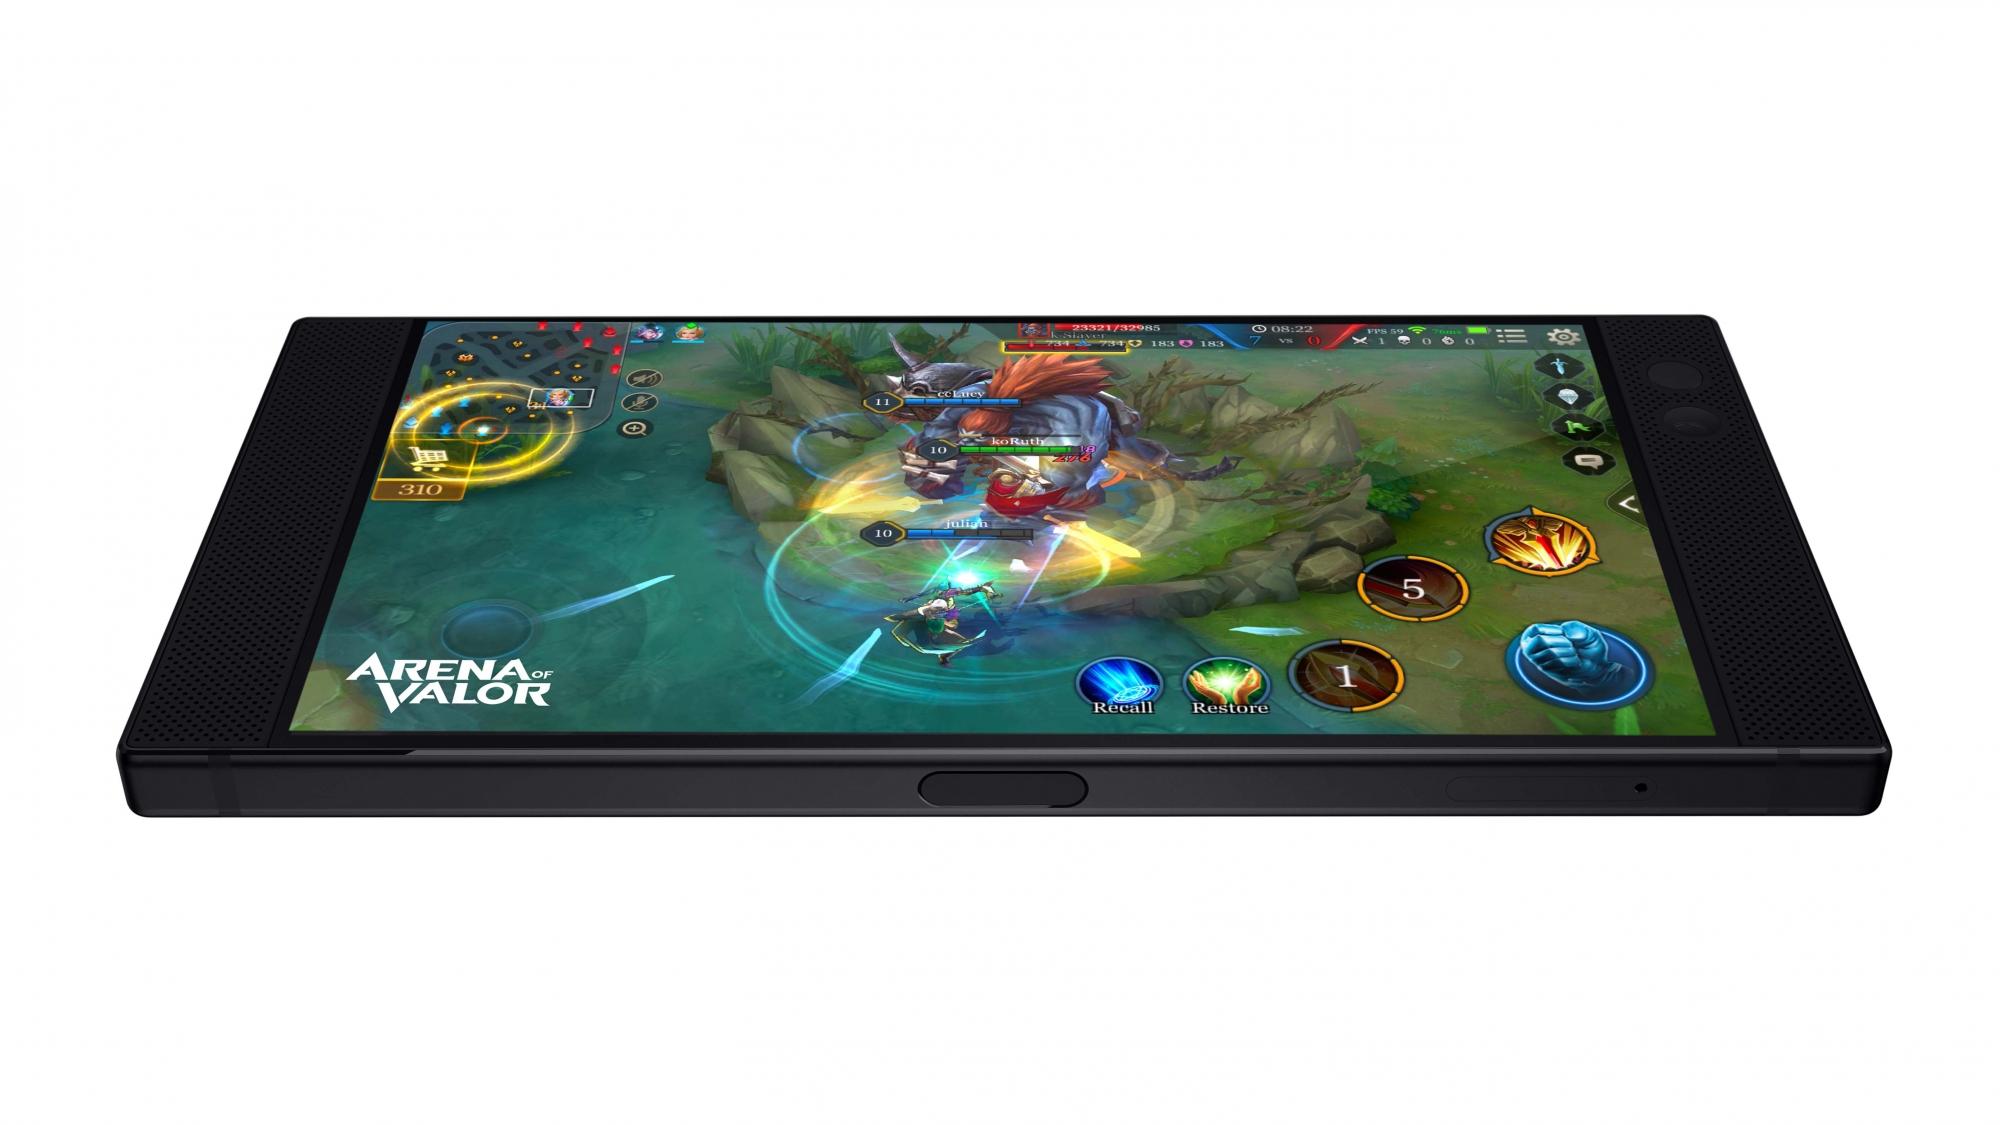 Razer-Phone-Games-Arena-of-Valor-01